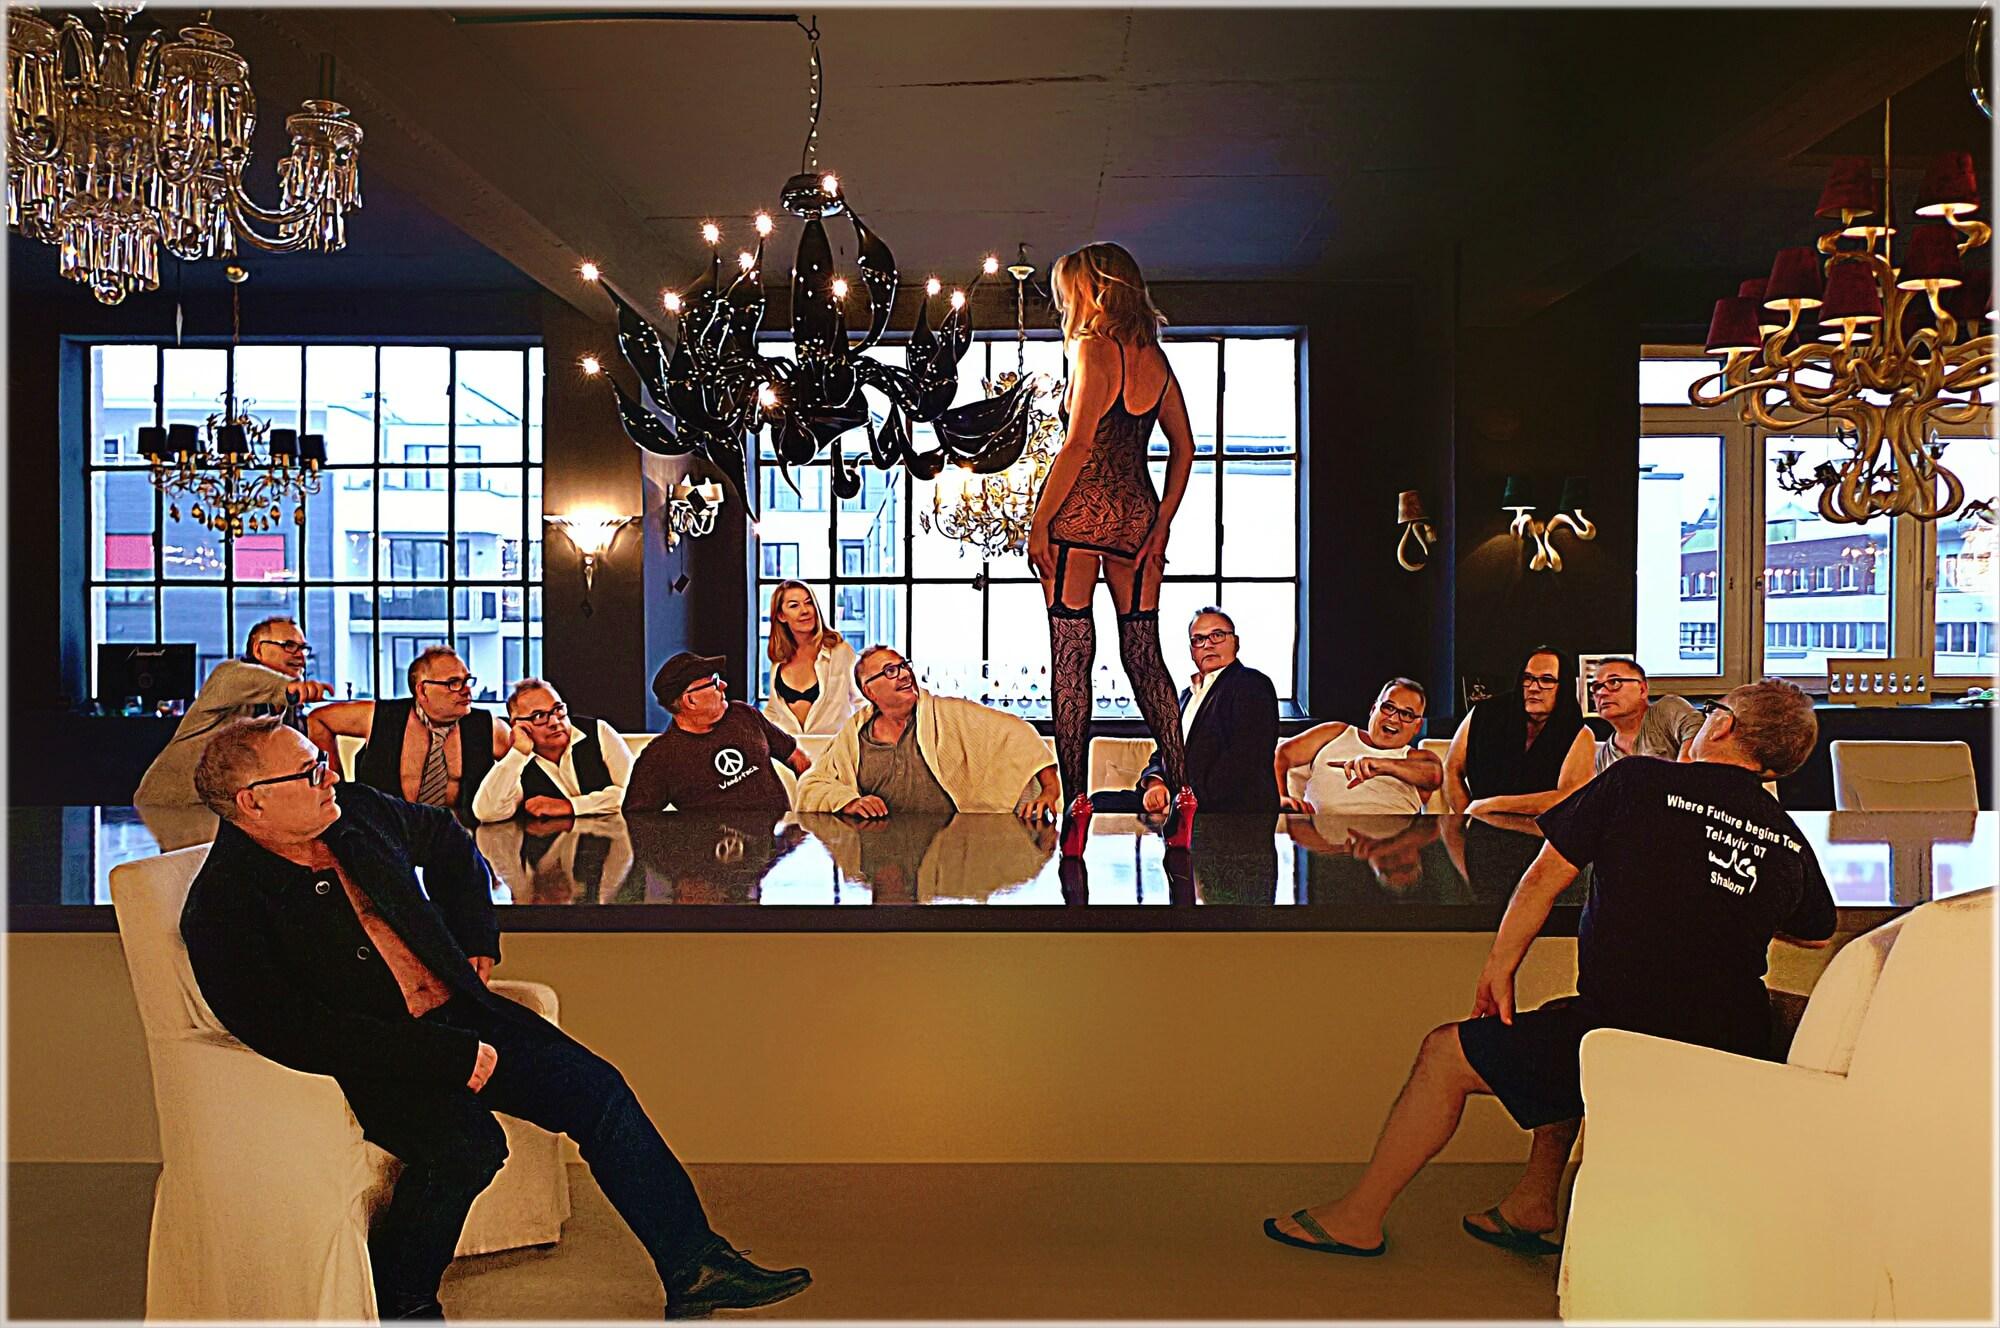 2014.11.30 LIGHTCOUTURE Showroom Winterhude